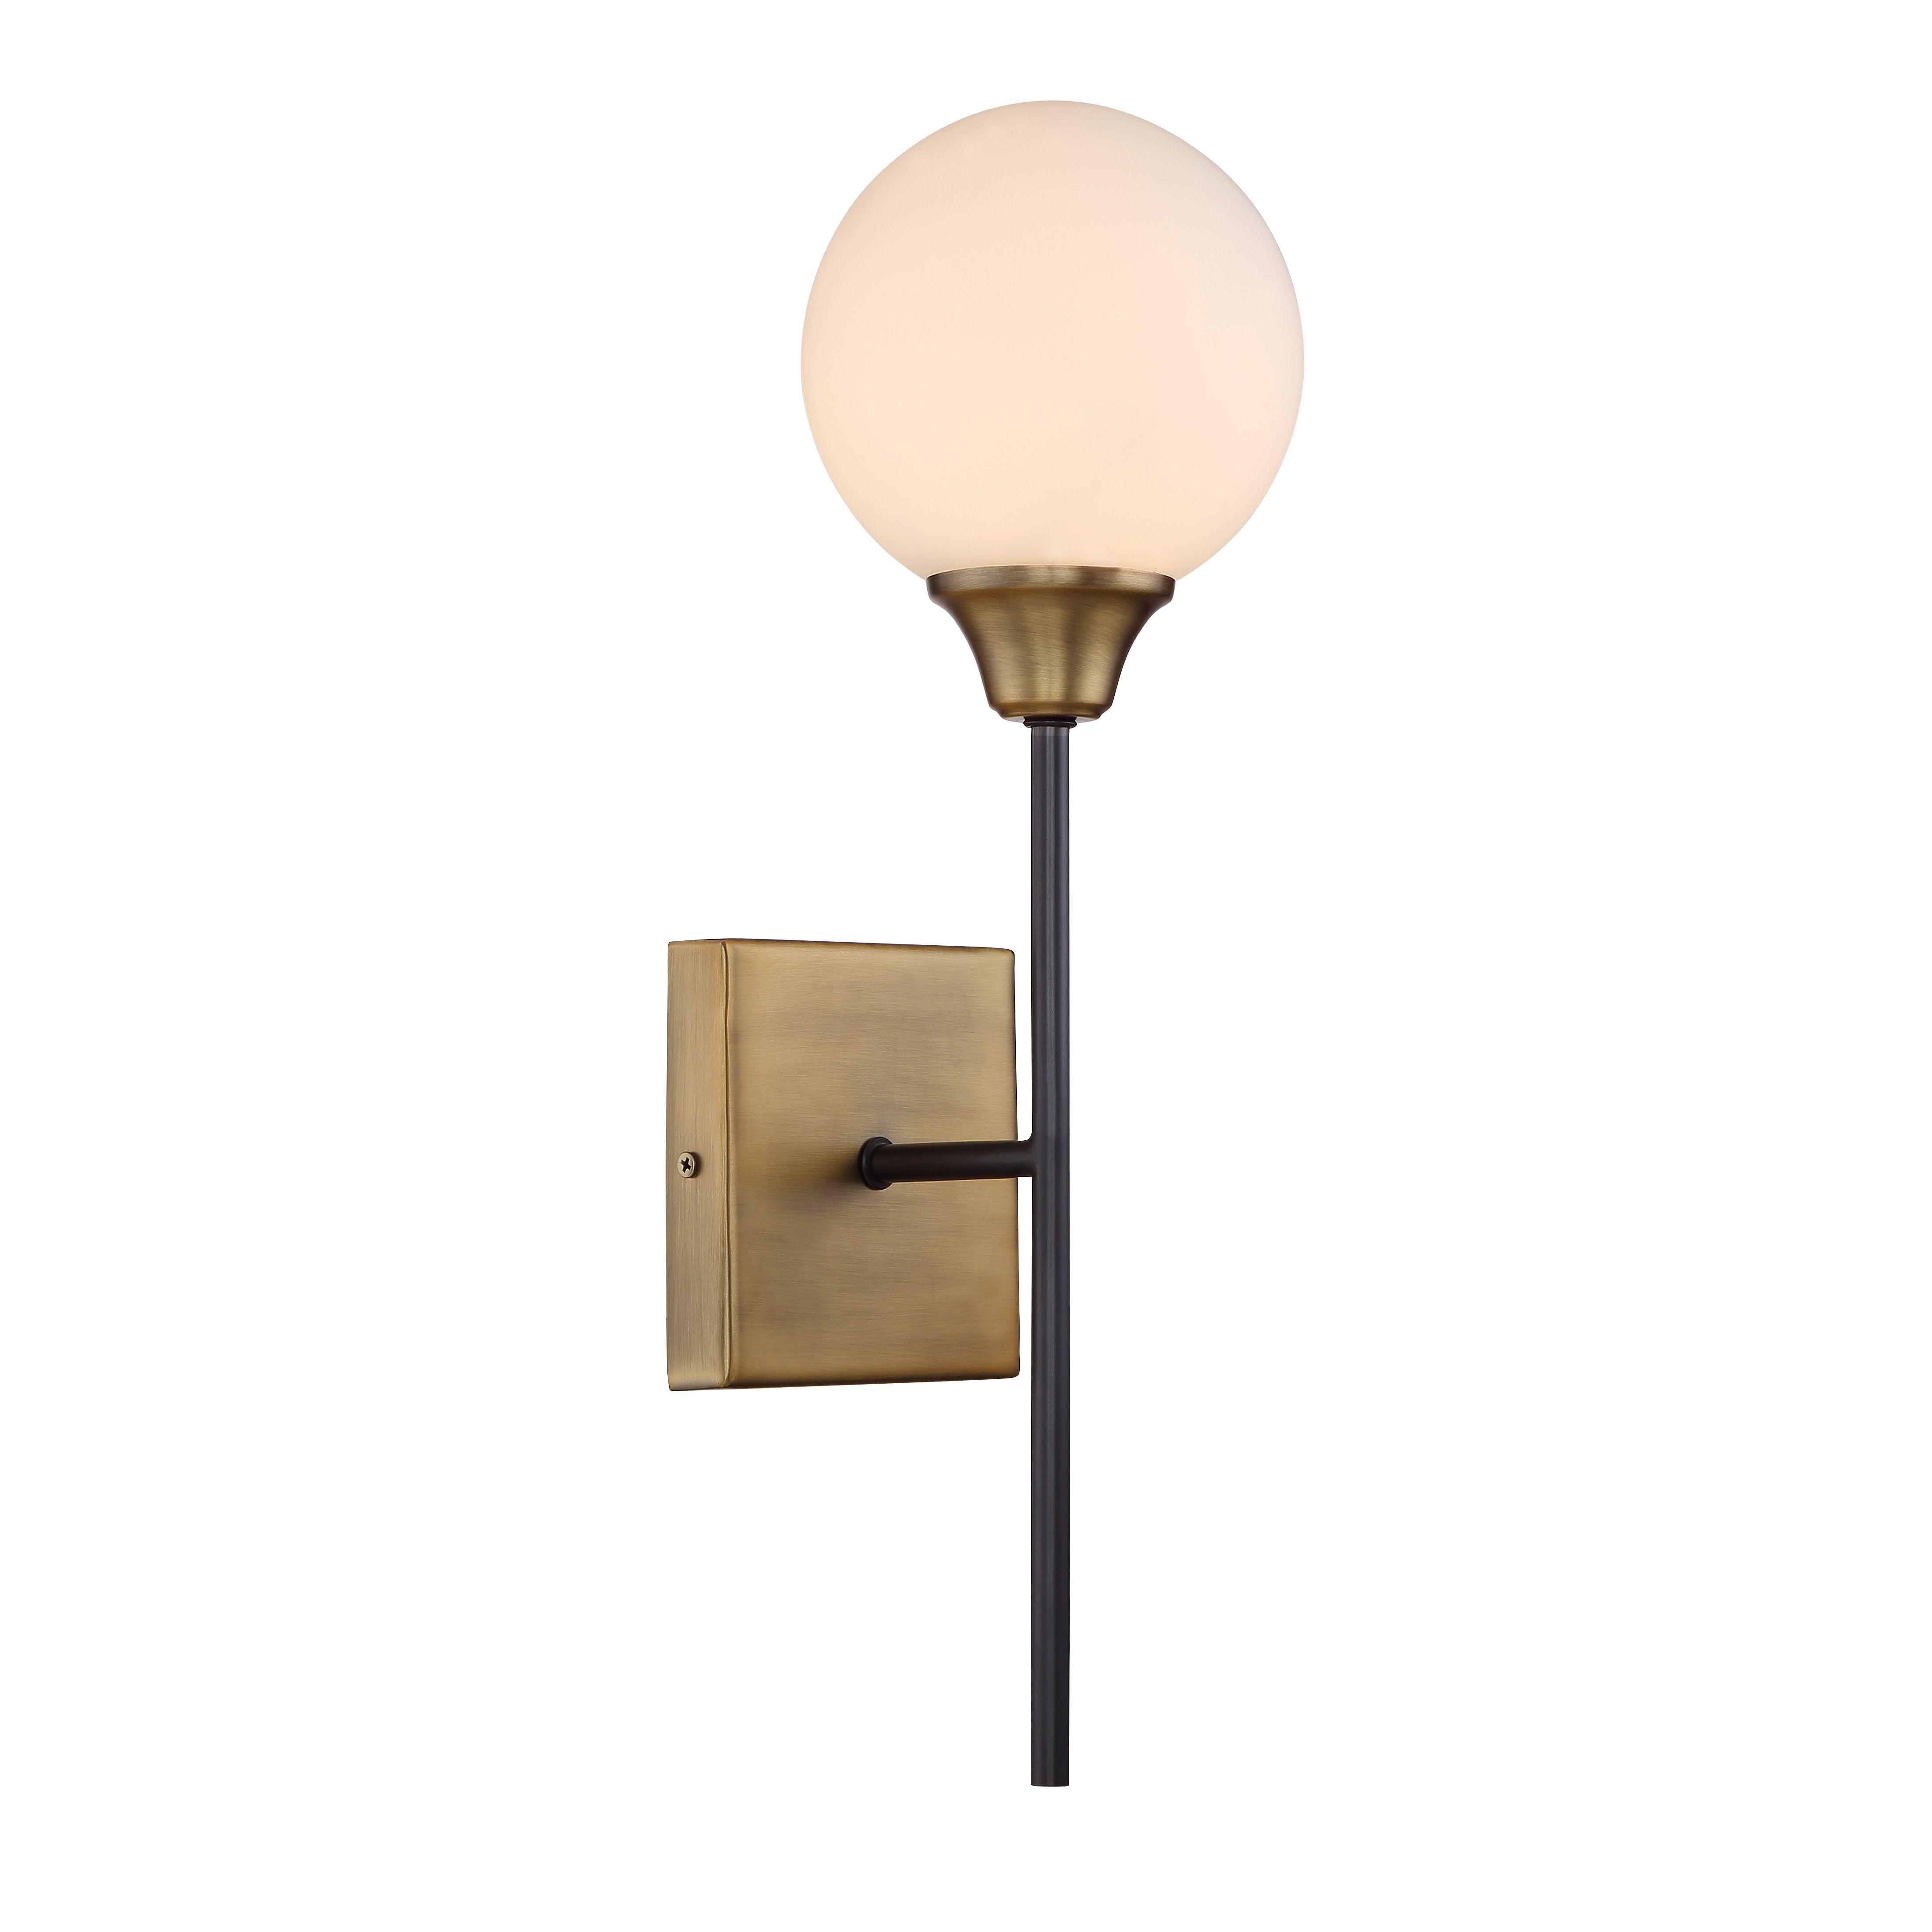 Chloe loft industrial 2 light oil rubbed bronze wall sconce free - Mercer41 St Helens 1 Light Wall Sconce